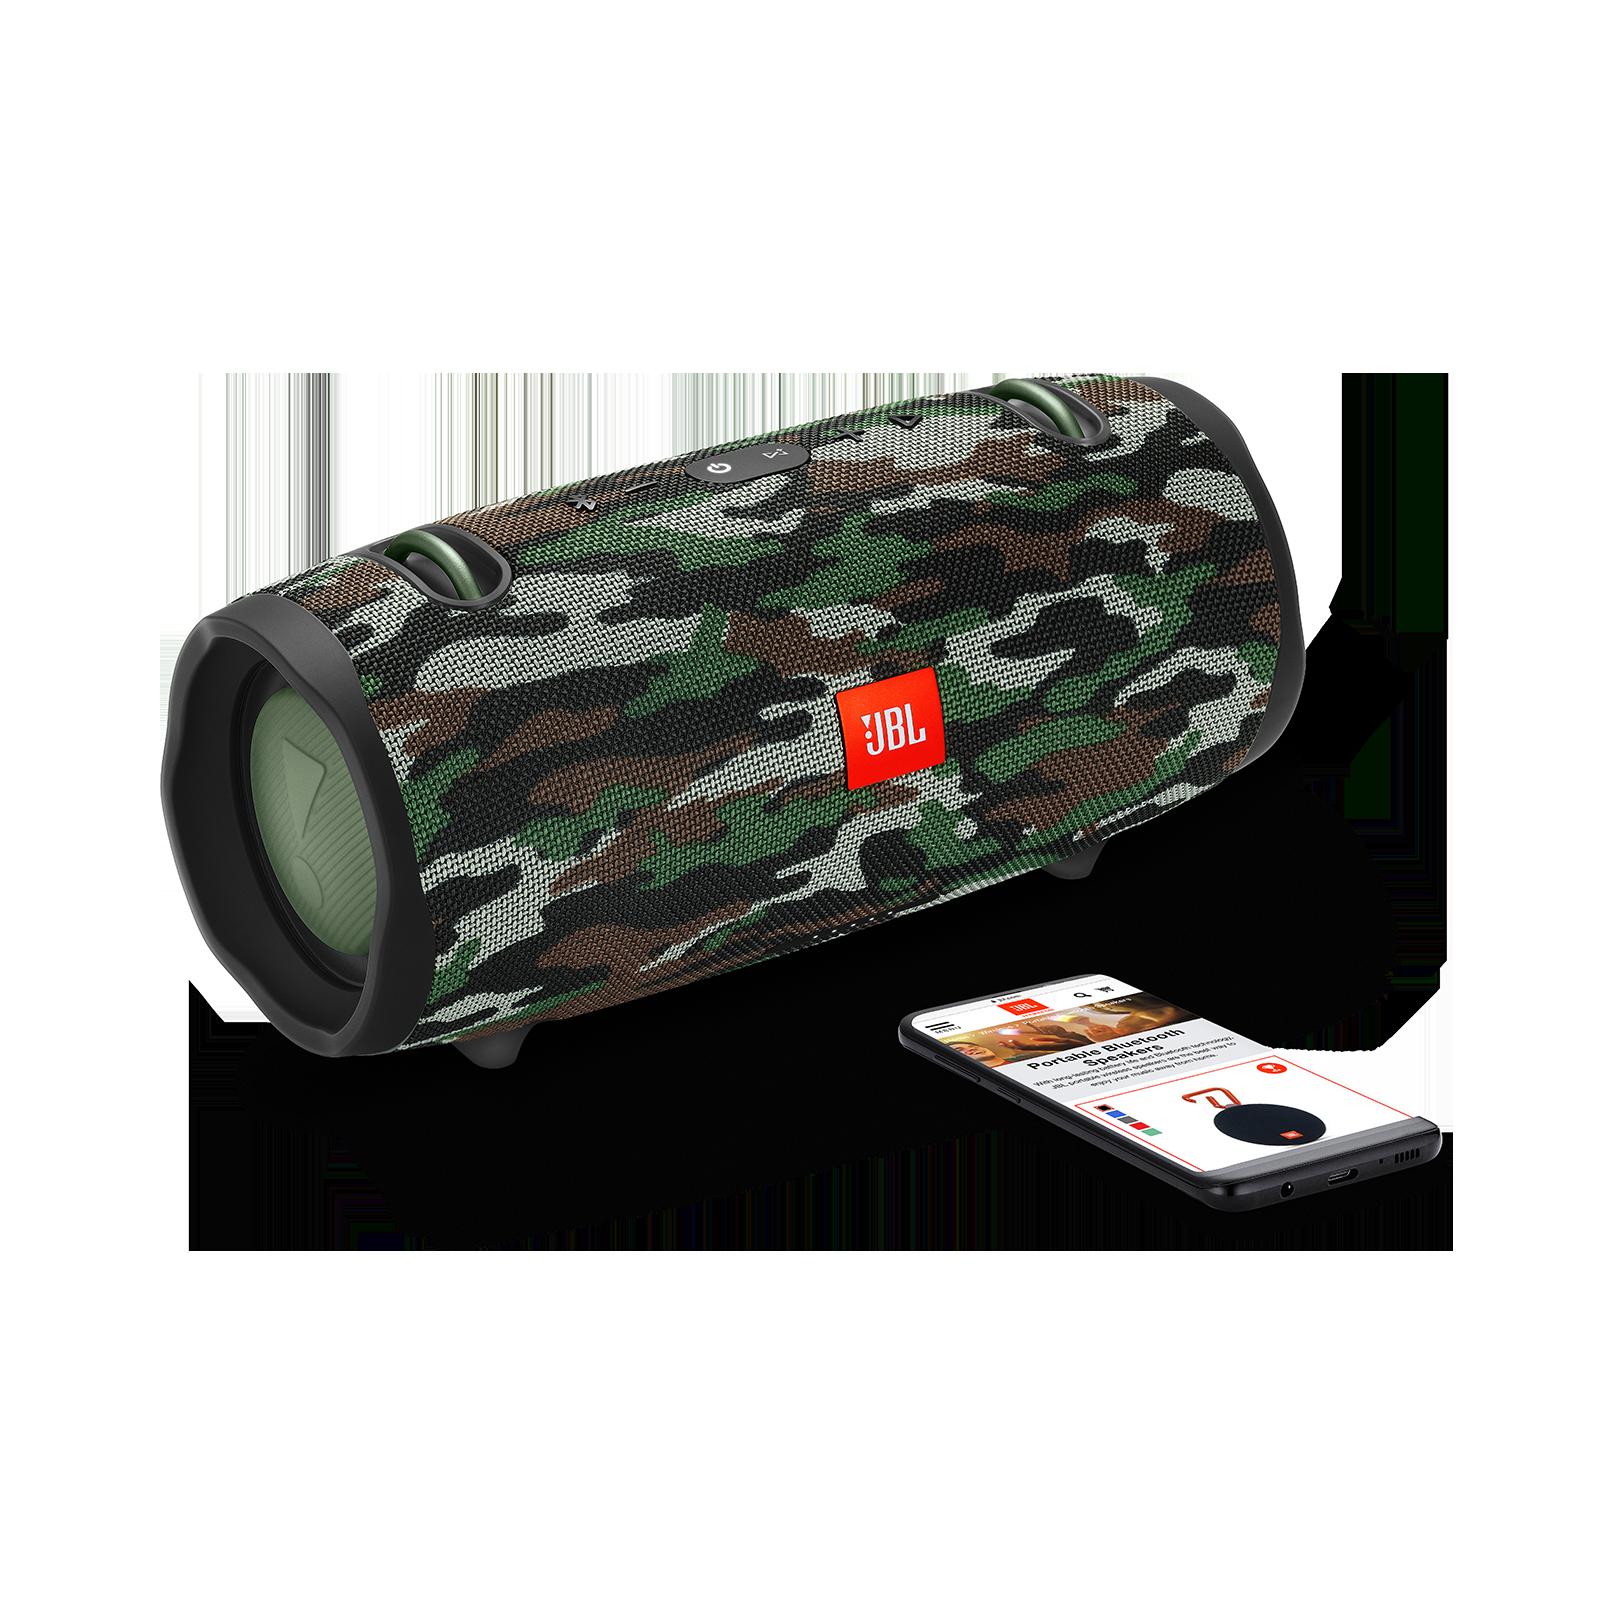 JBL Xtreme 2 - Squad - Portable Bluetooth Speaker - Detailshot 1